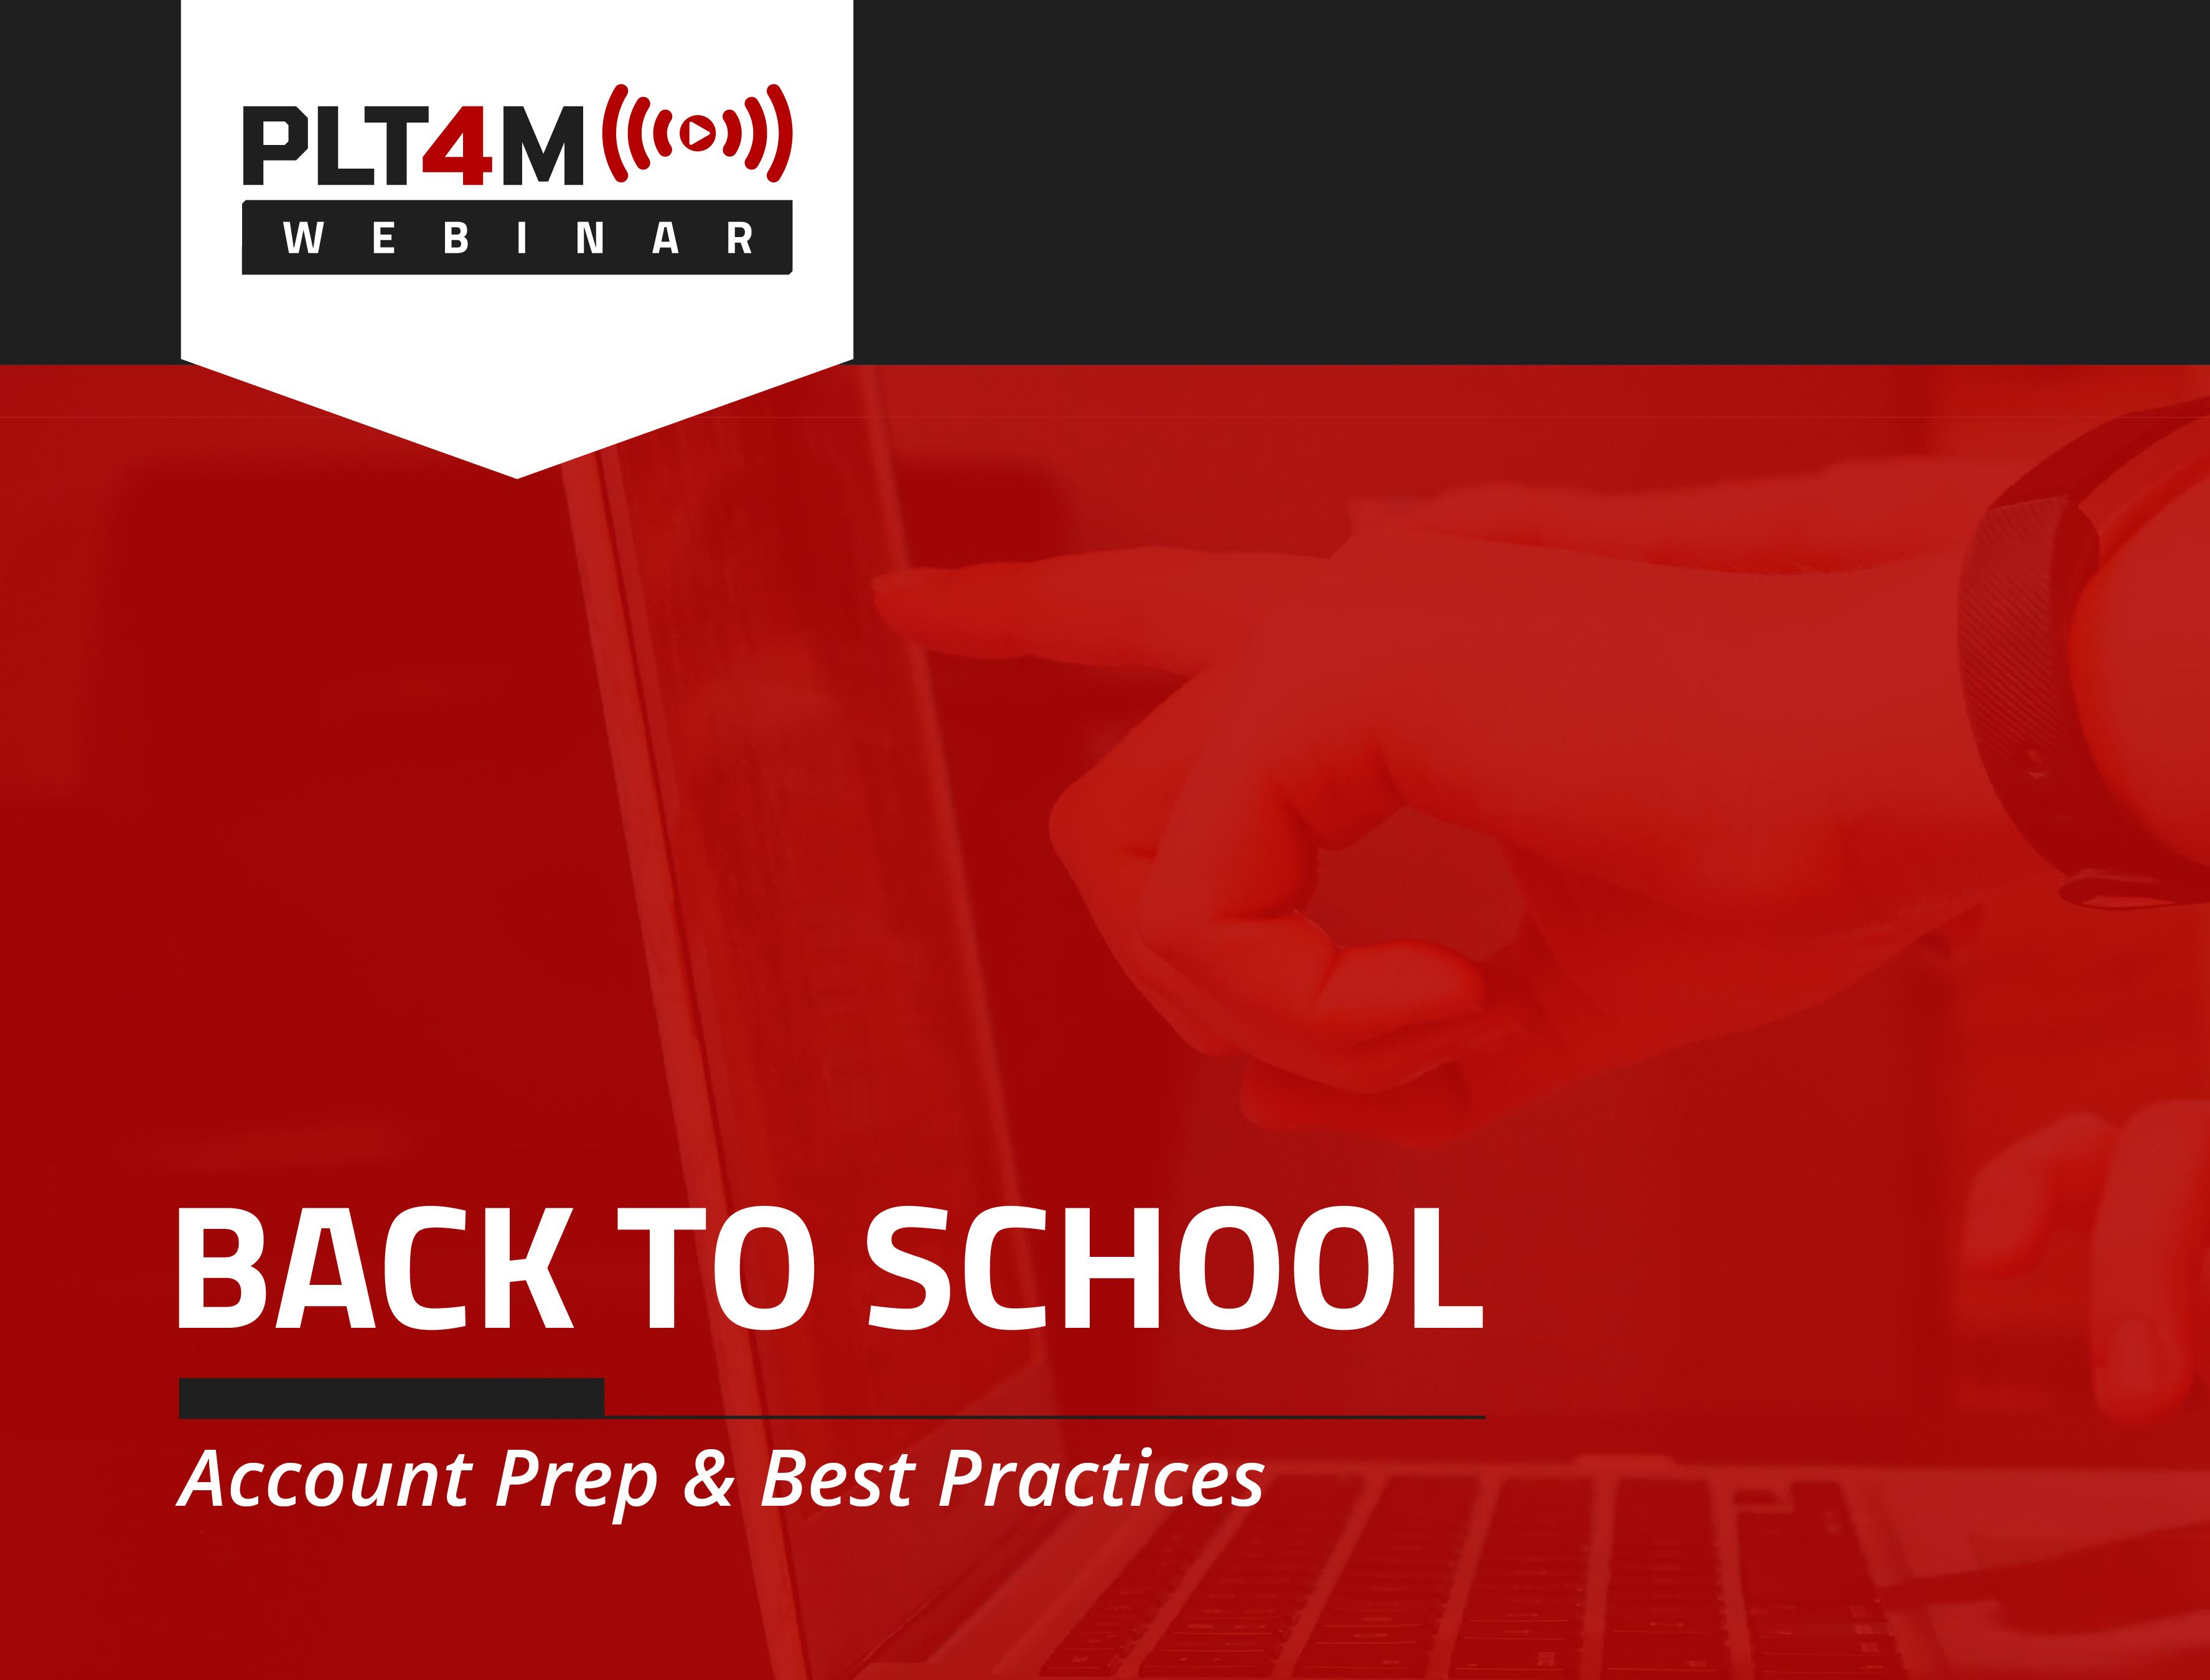 Back to School: Account Prep & Best Practices